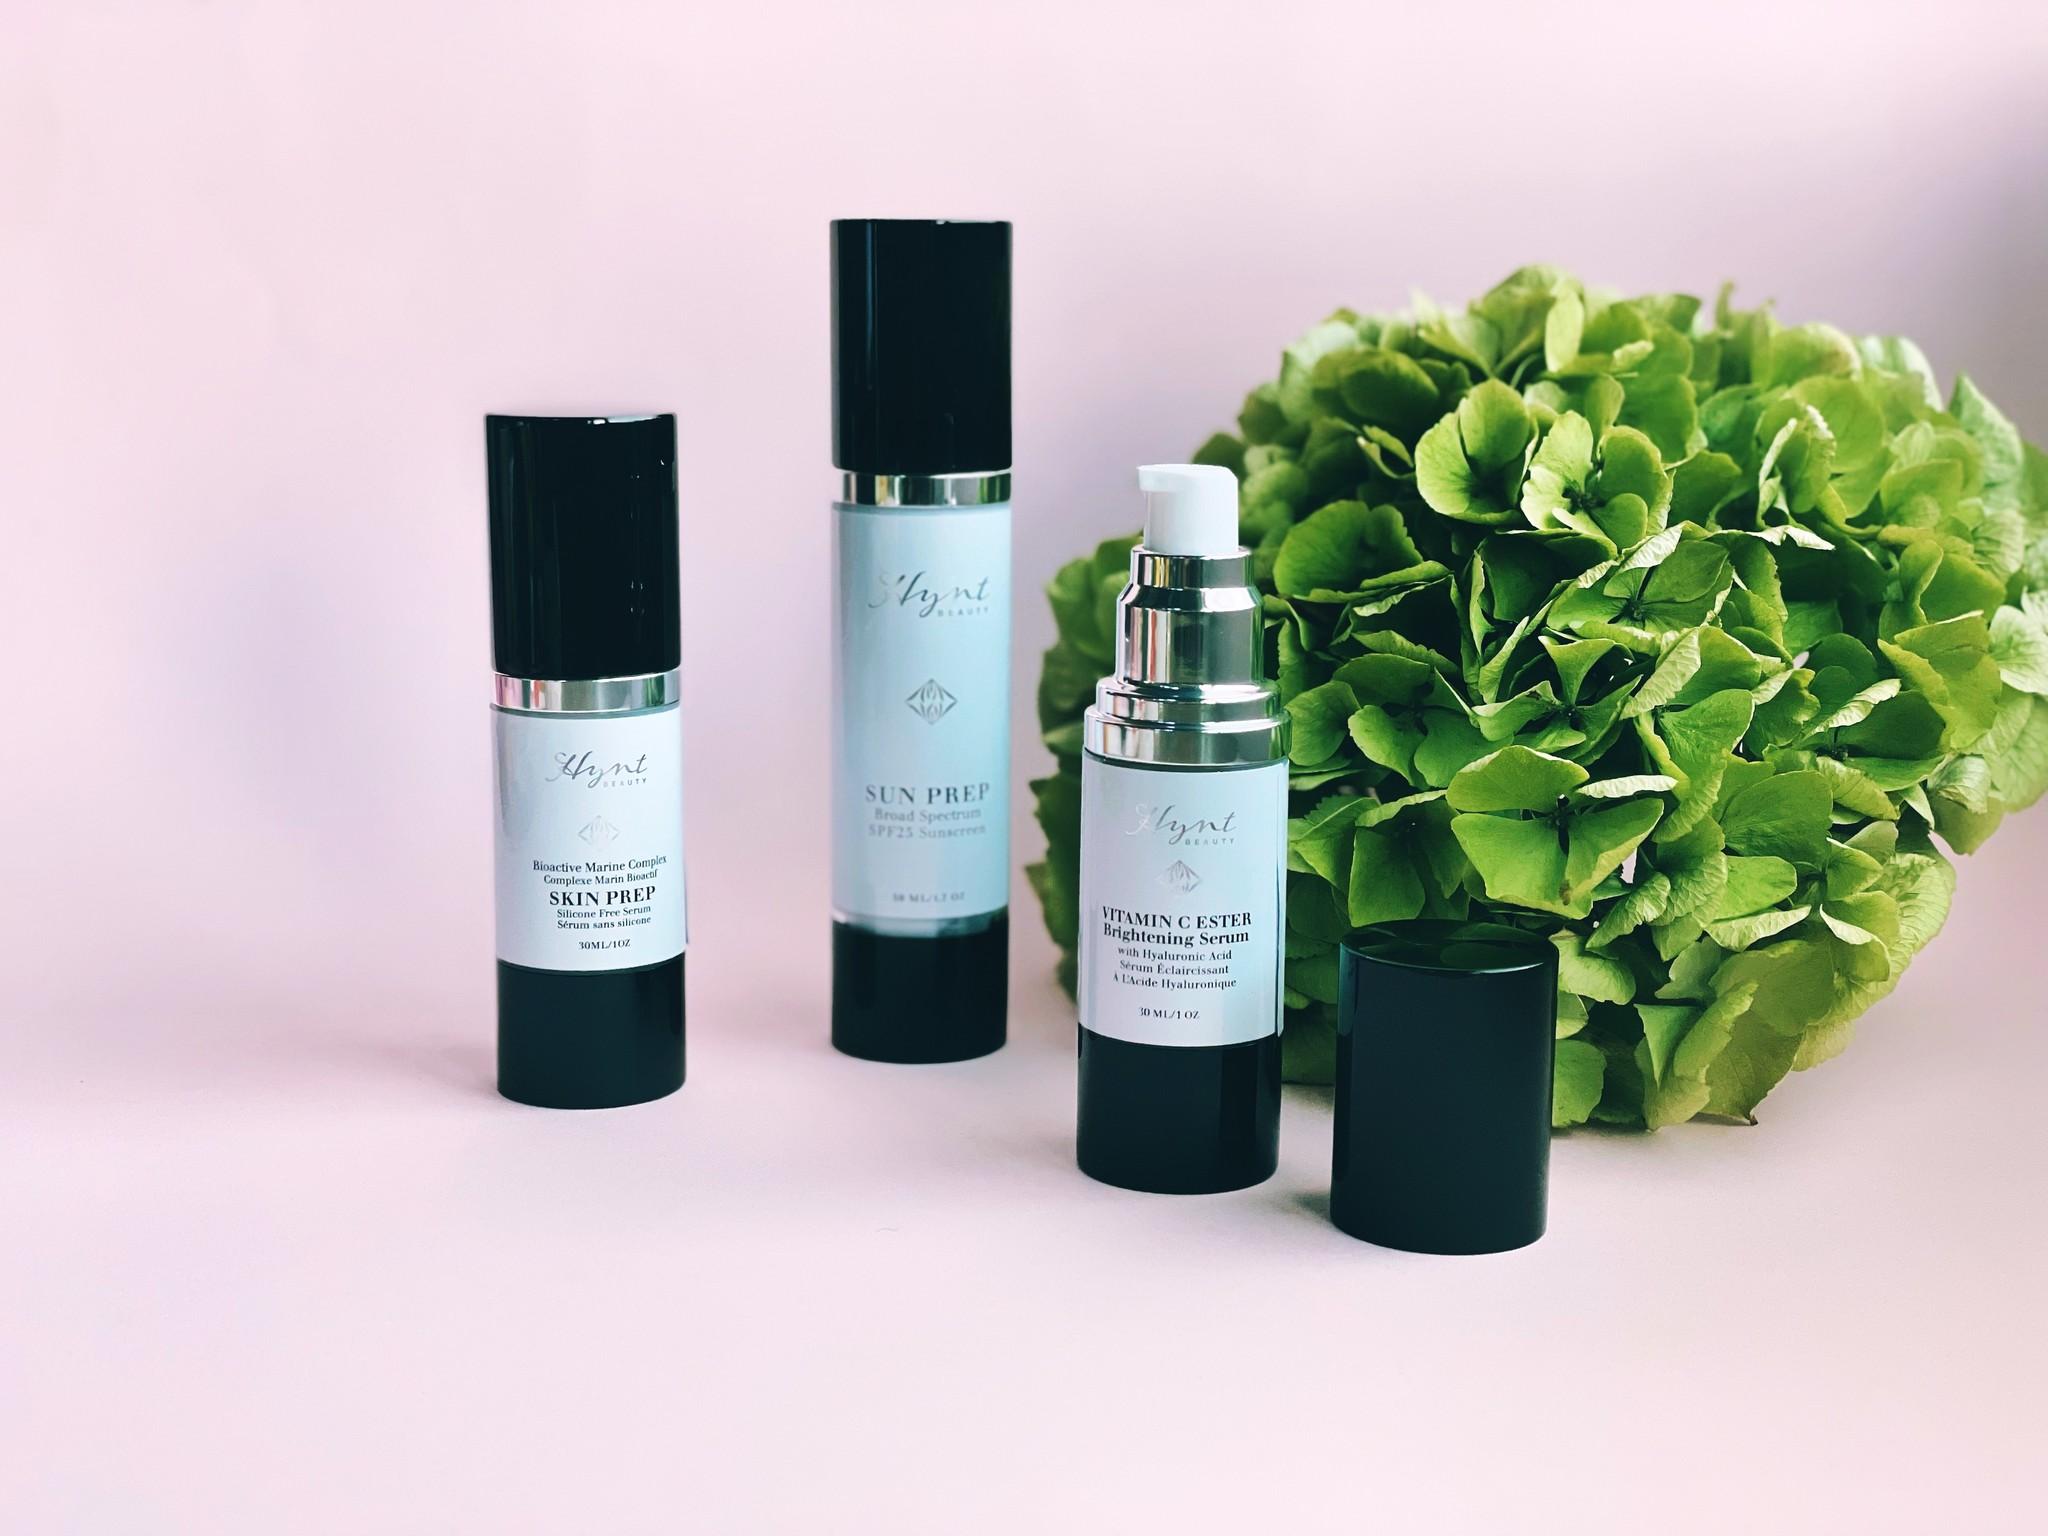 Hynt Beauty Skincare